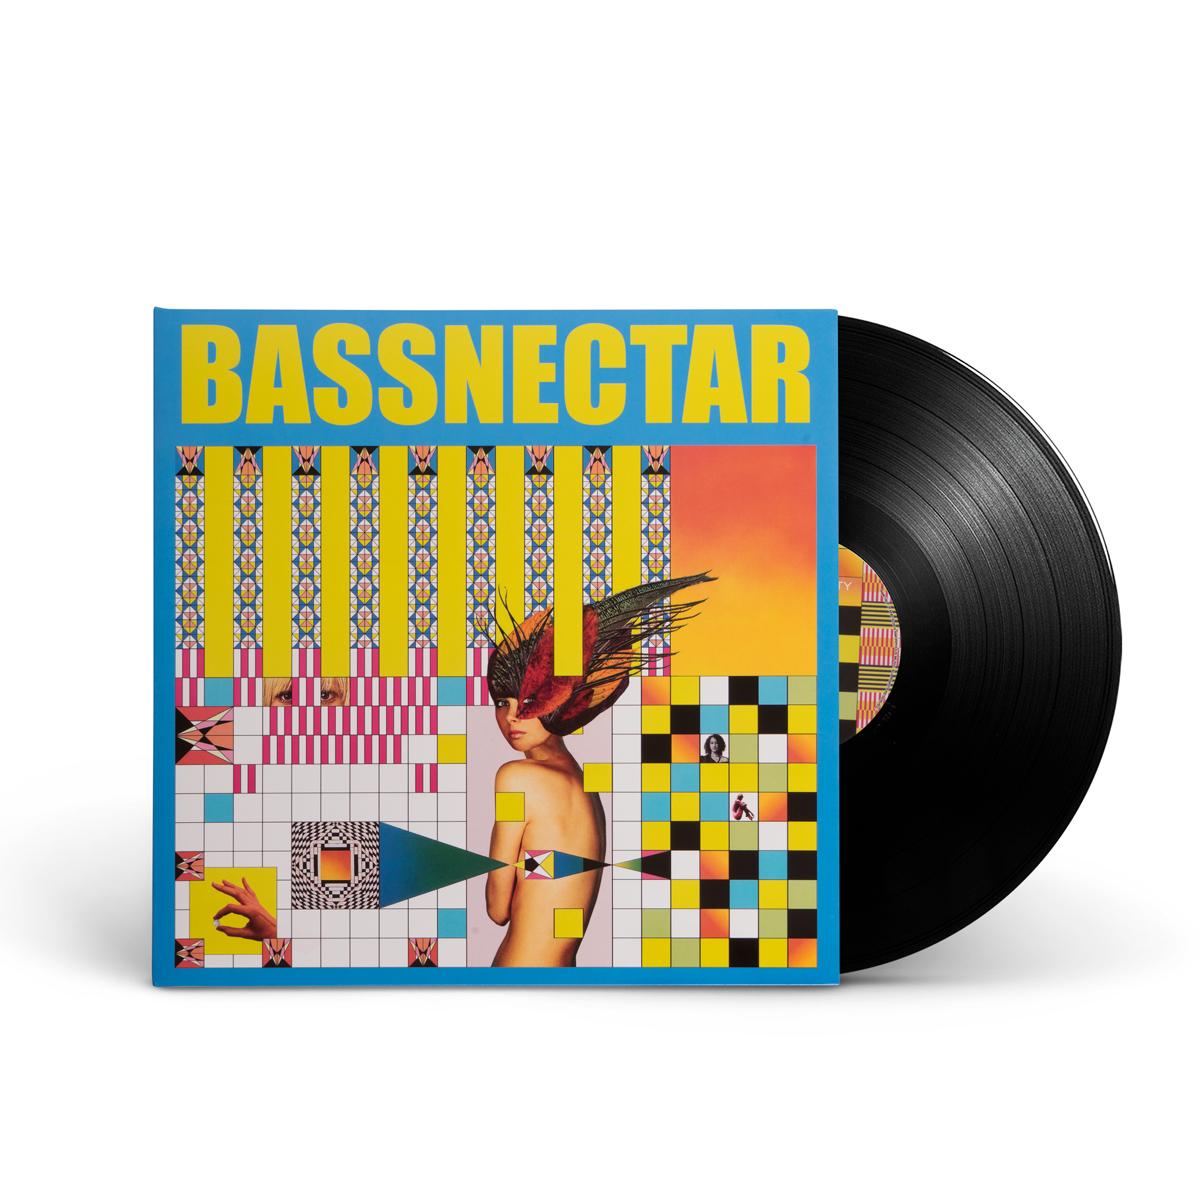 Bassnectar - Noise vs. Beauty Double Vinyl